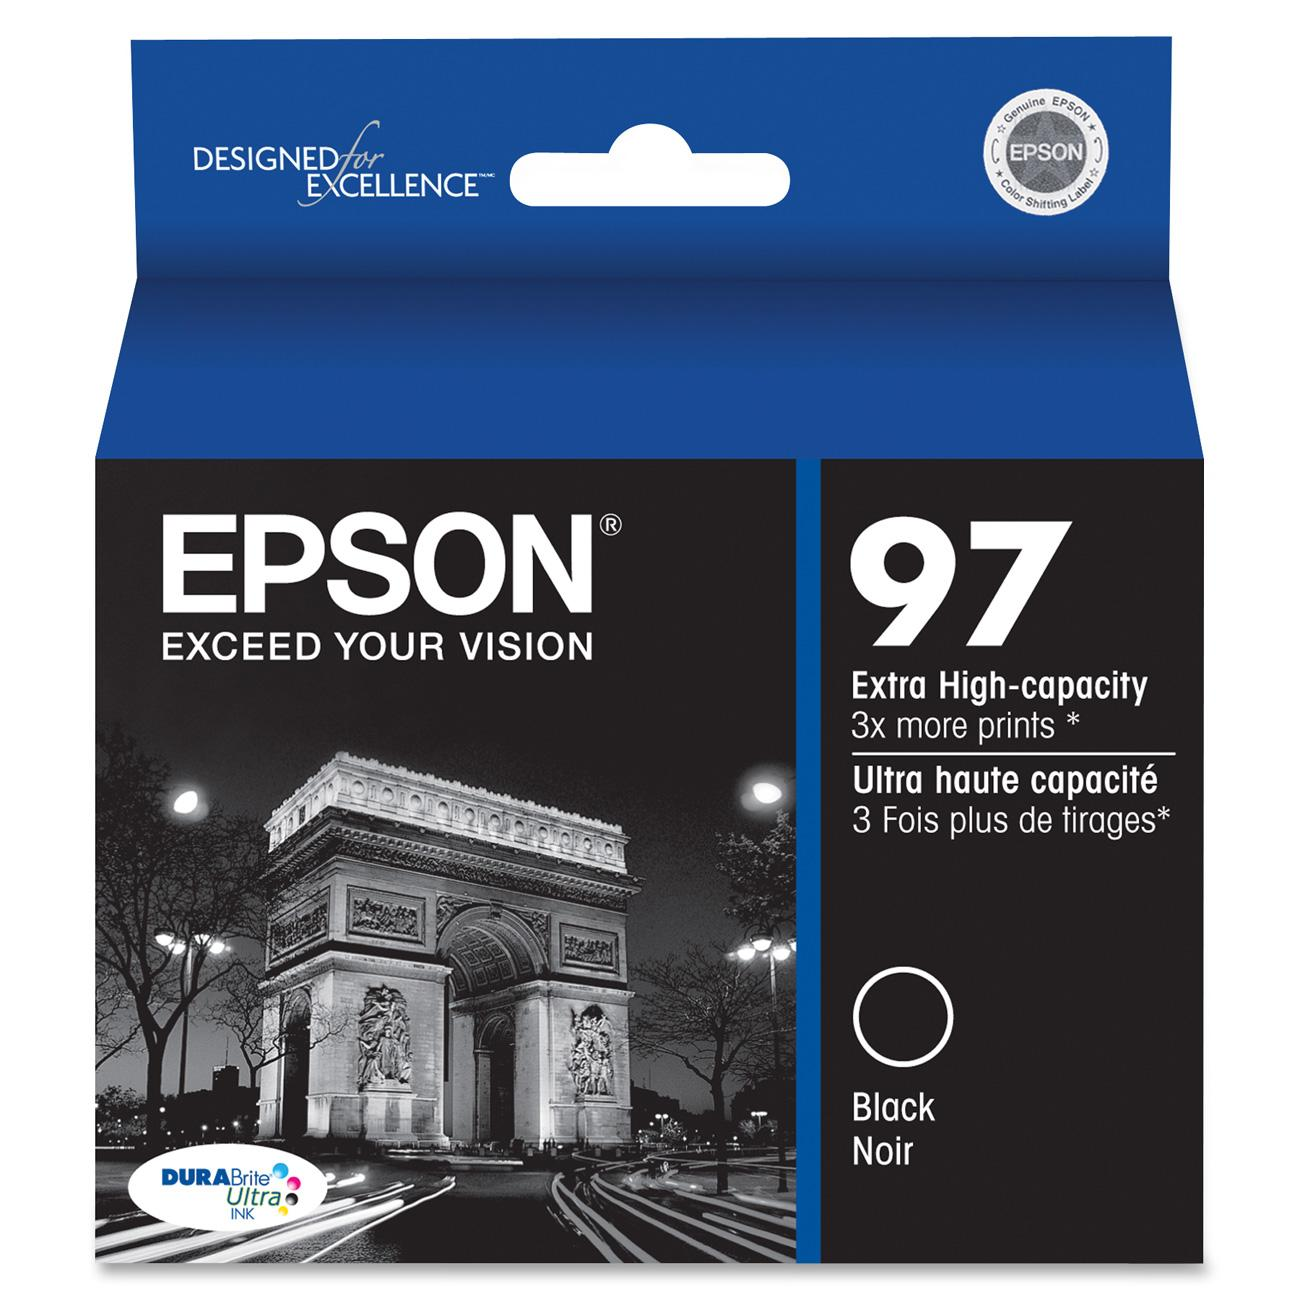 Epson Original Ink Cartridge, 1 Each (Quantity) by Epson